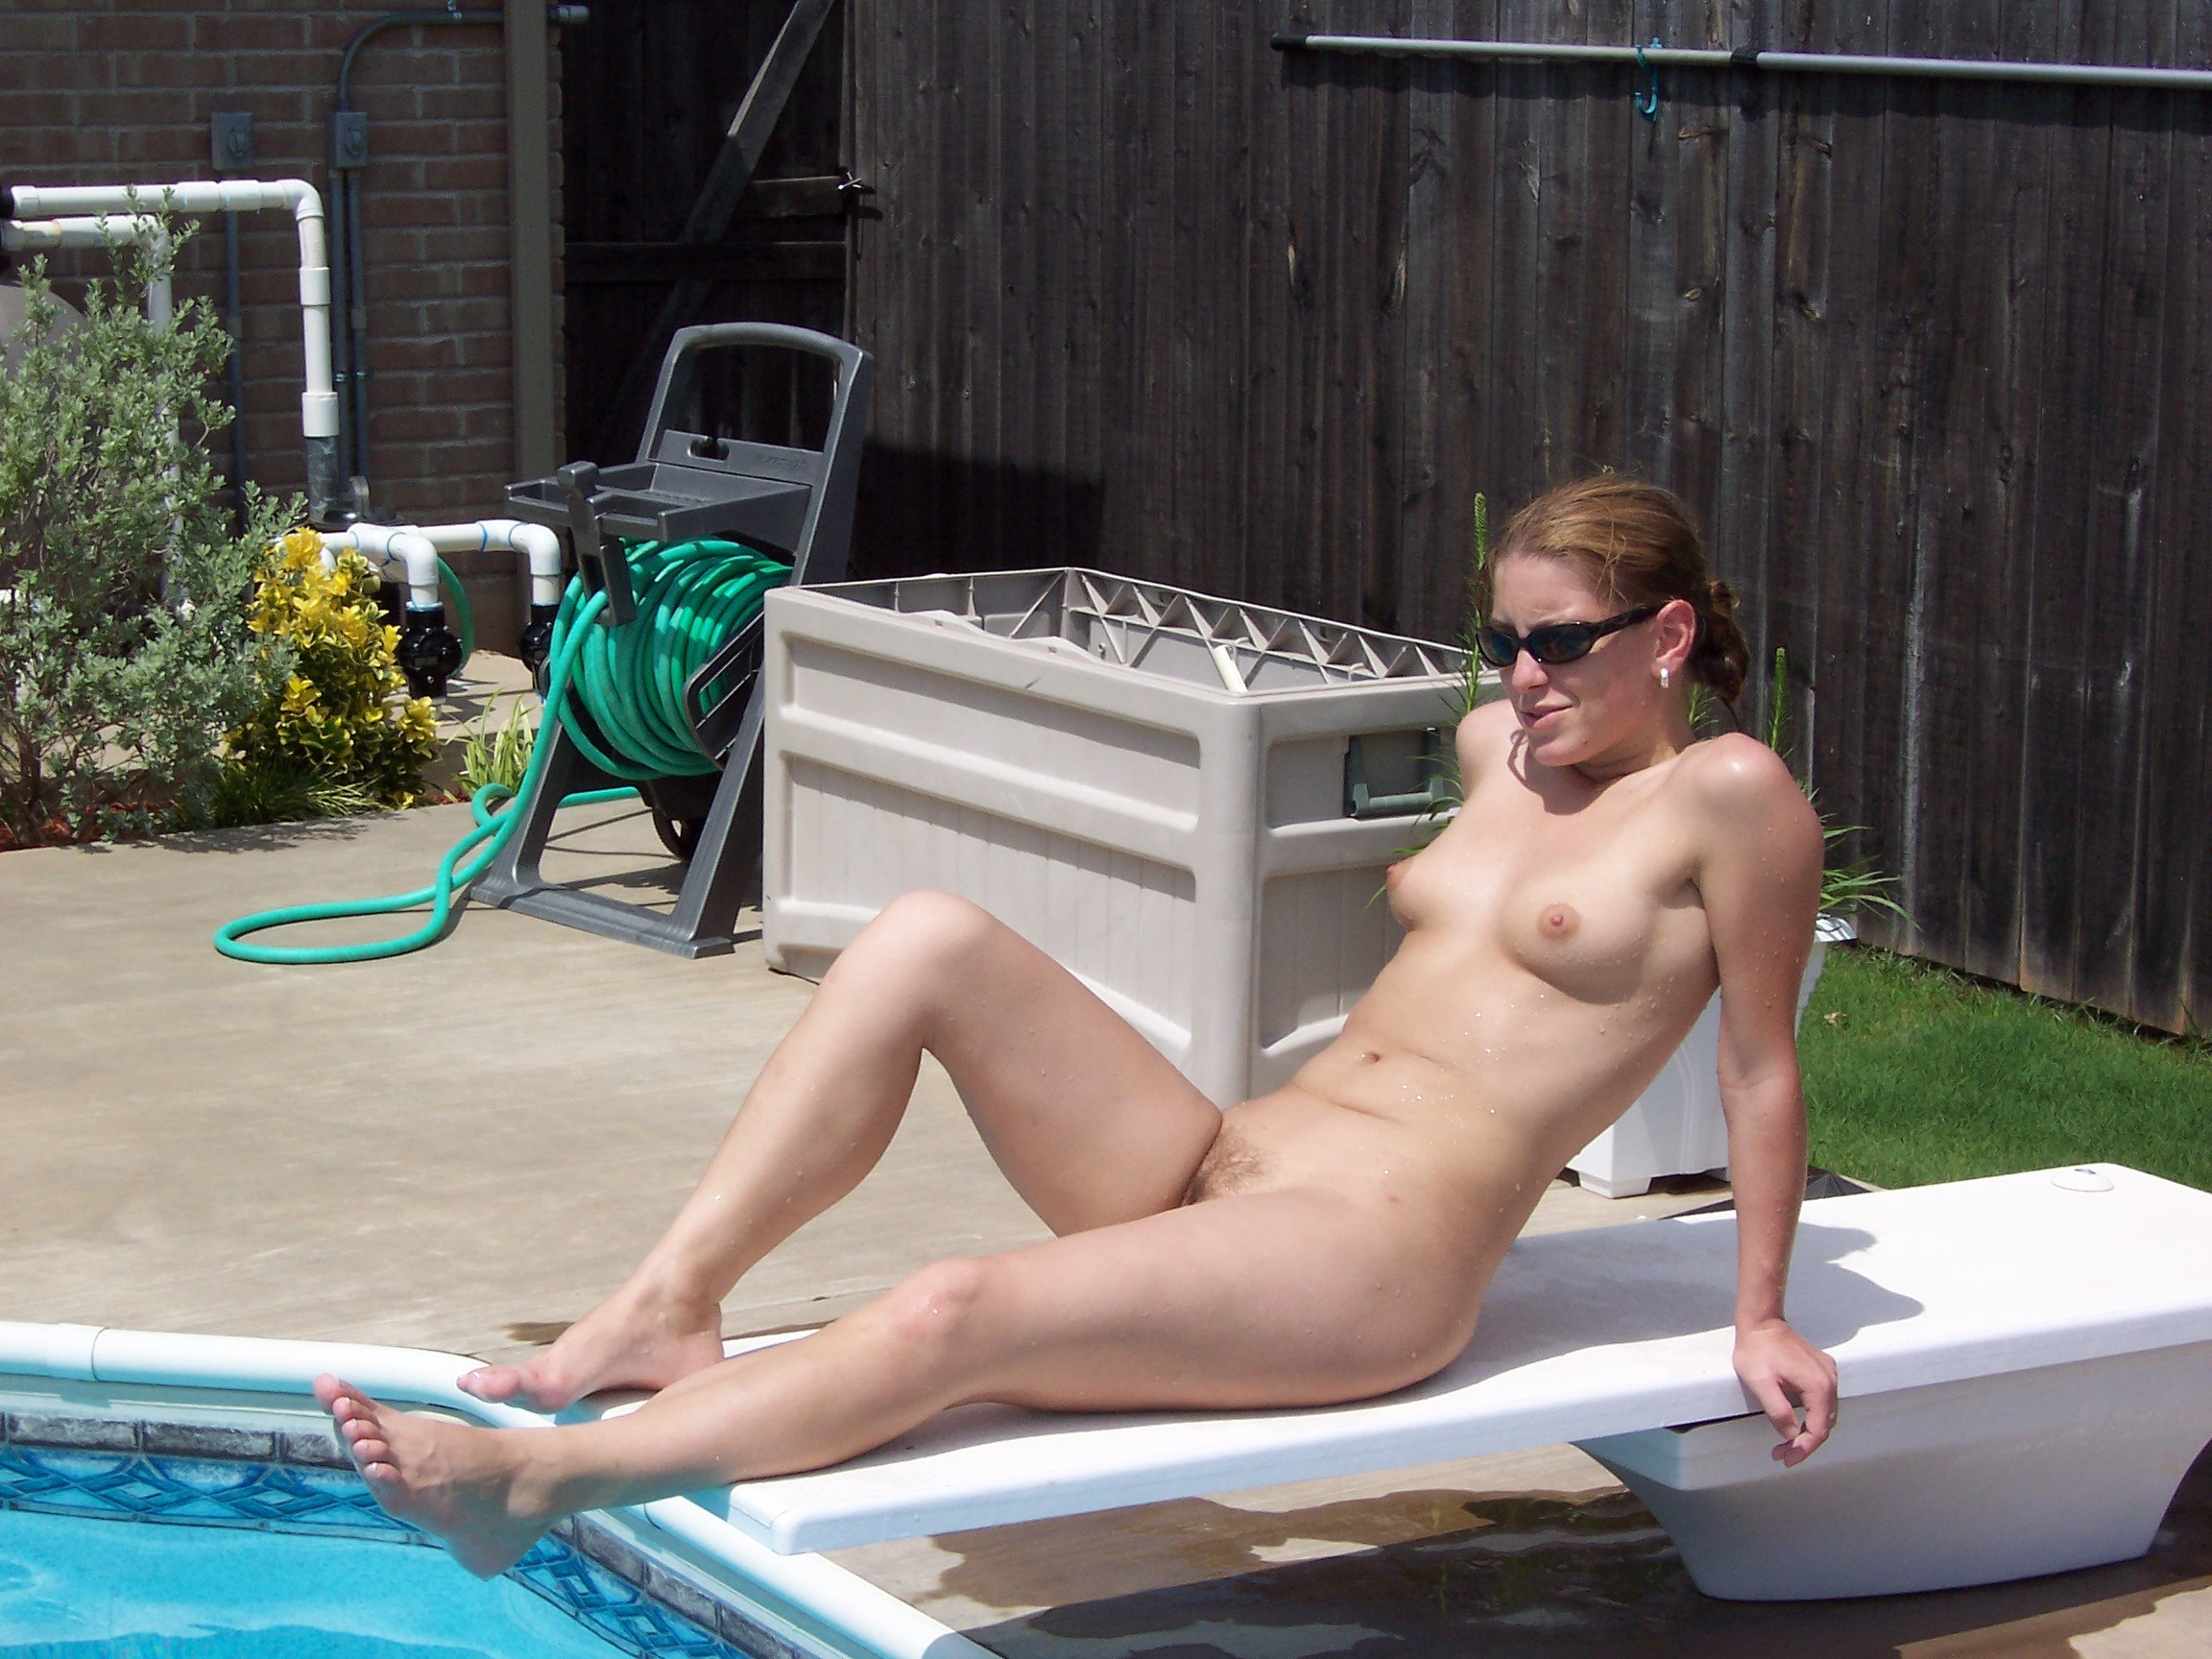 swimming-pool-amateur-spankwire